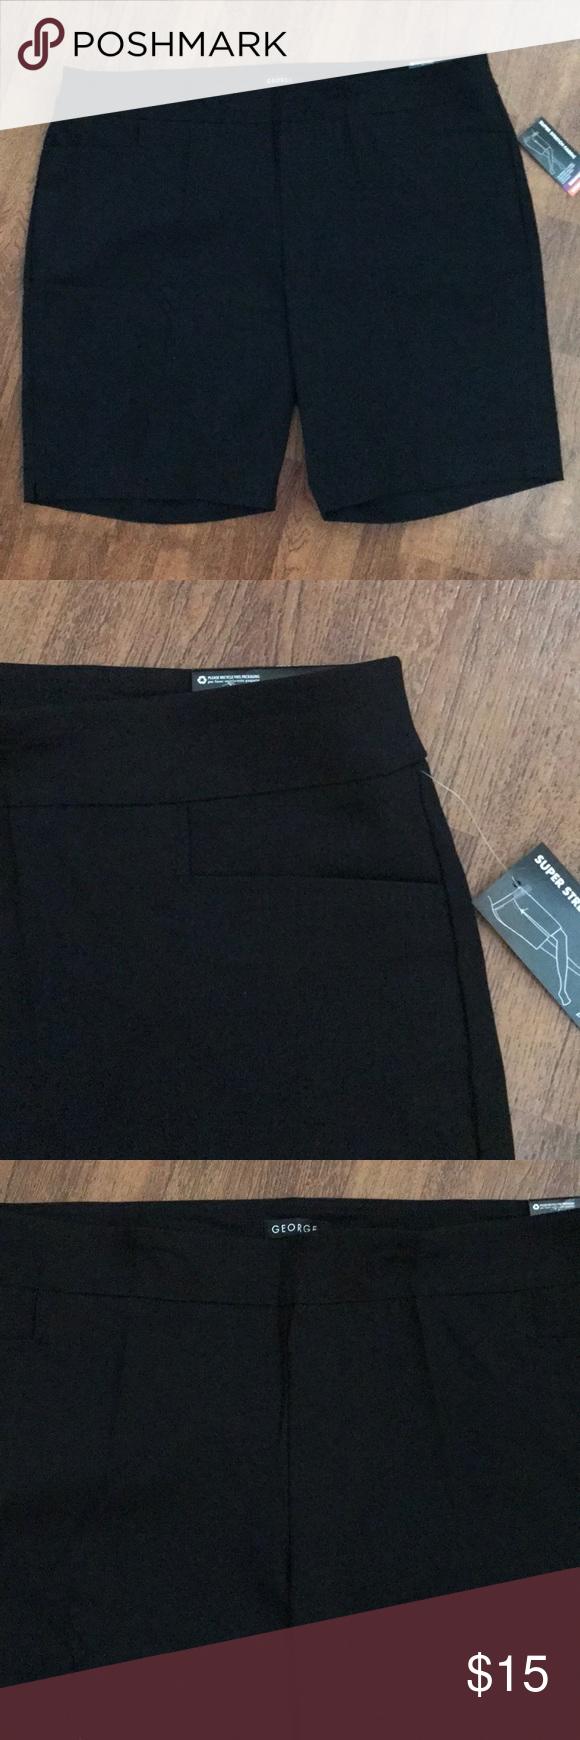 fd23857fd8f85 Two shallow front pockets. 77% rayon 20% nylon 3% spandex. Super stretch  fabric. (18w-20w) George Shorts Bermudas. Women s Black Plus Size Bermuda  ...